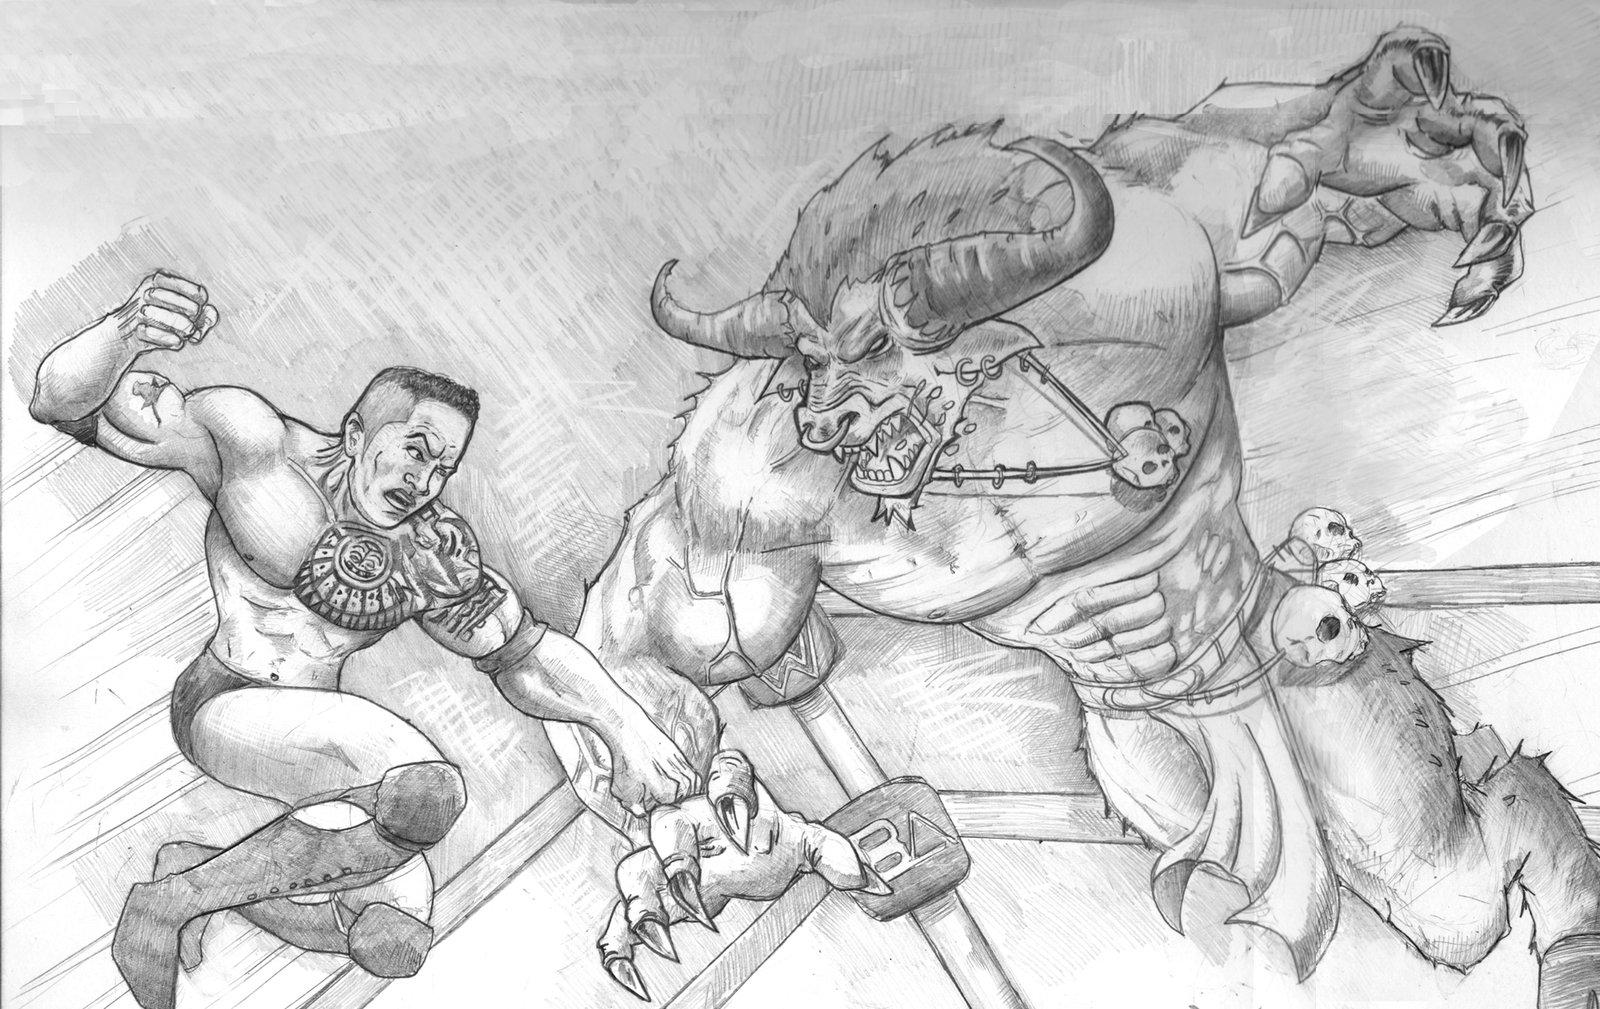 Drawn bull brahma bull By Bull dreno360 The on